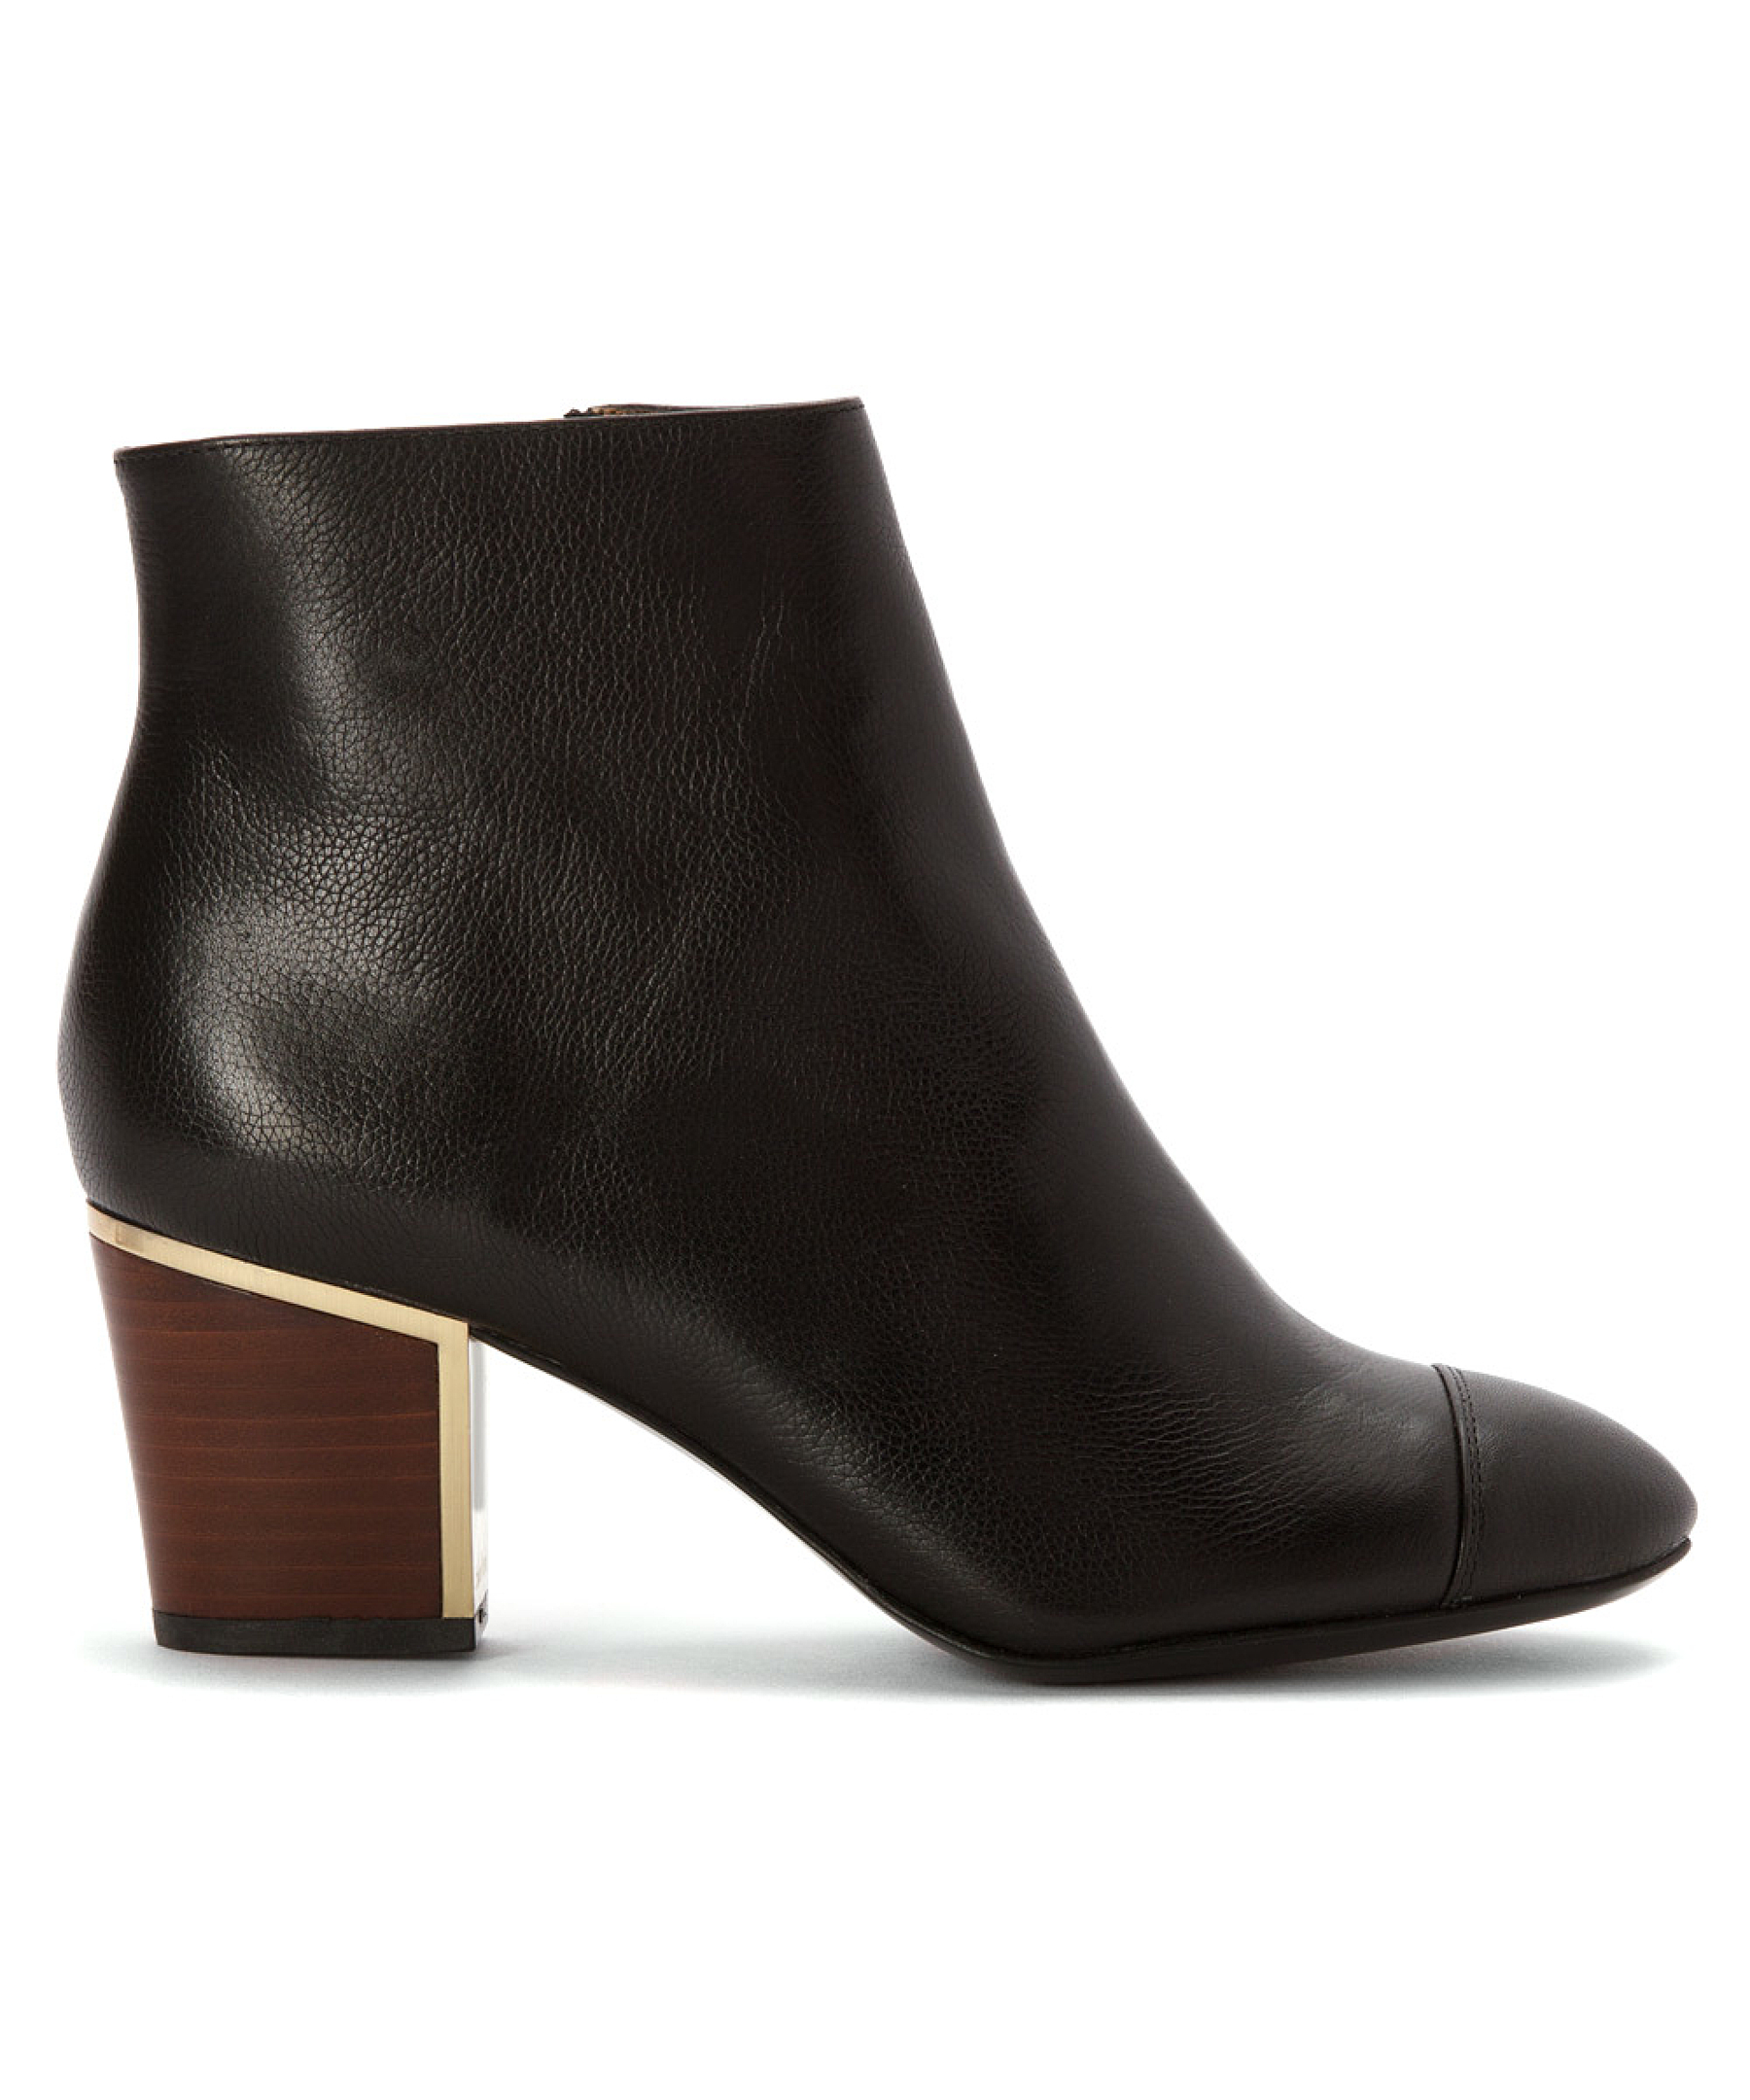 calvin klein s kristi boots in black lyst